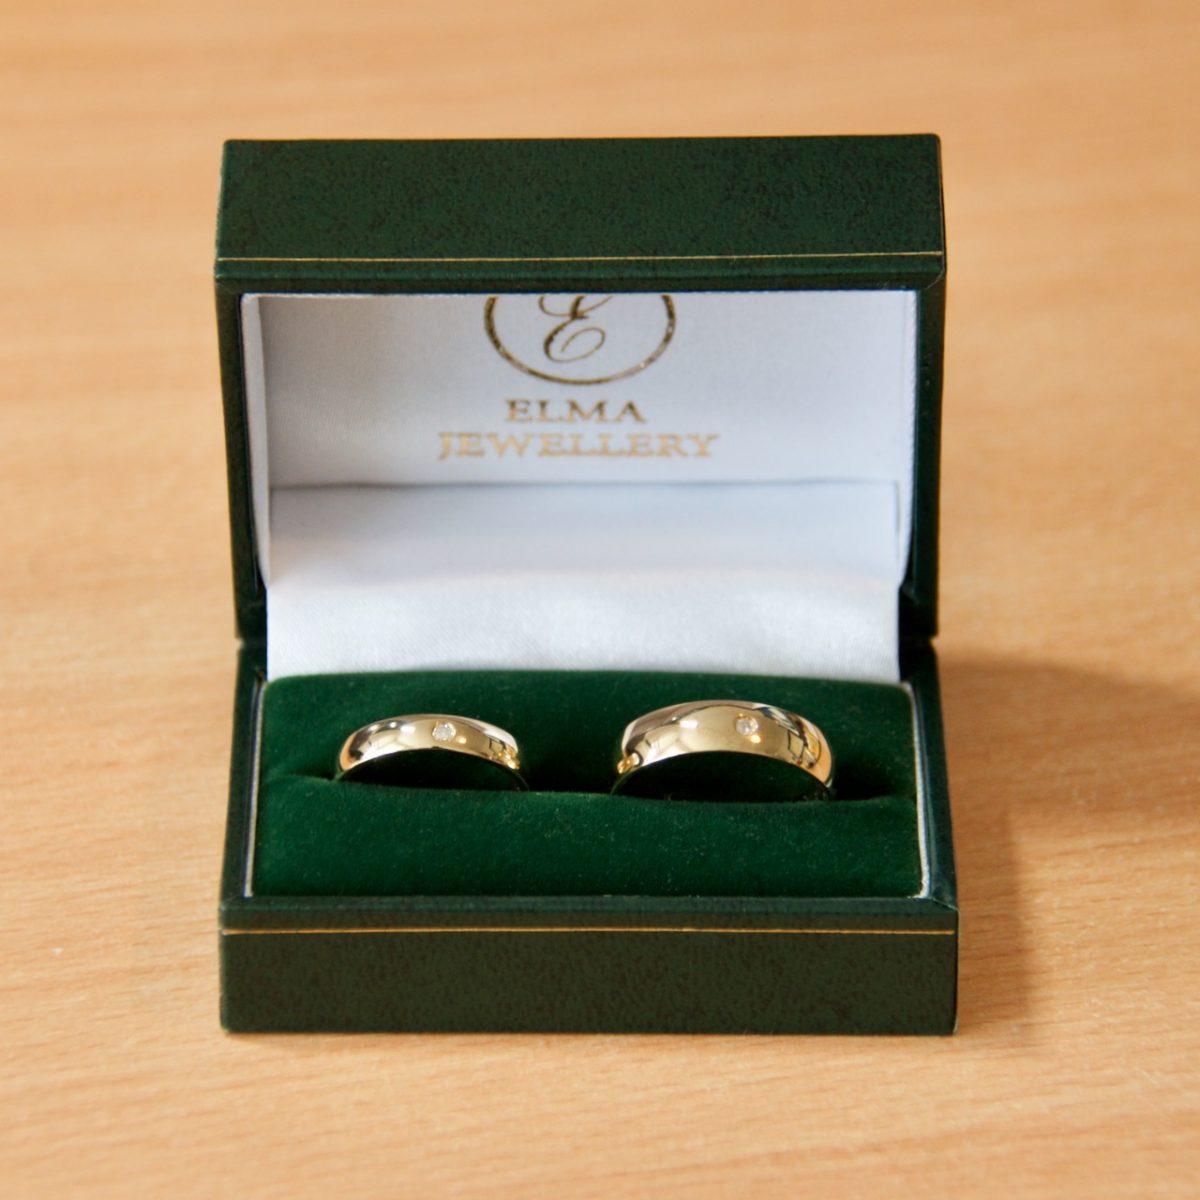 The wedding rings - 9 carat gold with 1 carat diamonds